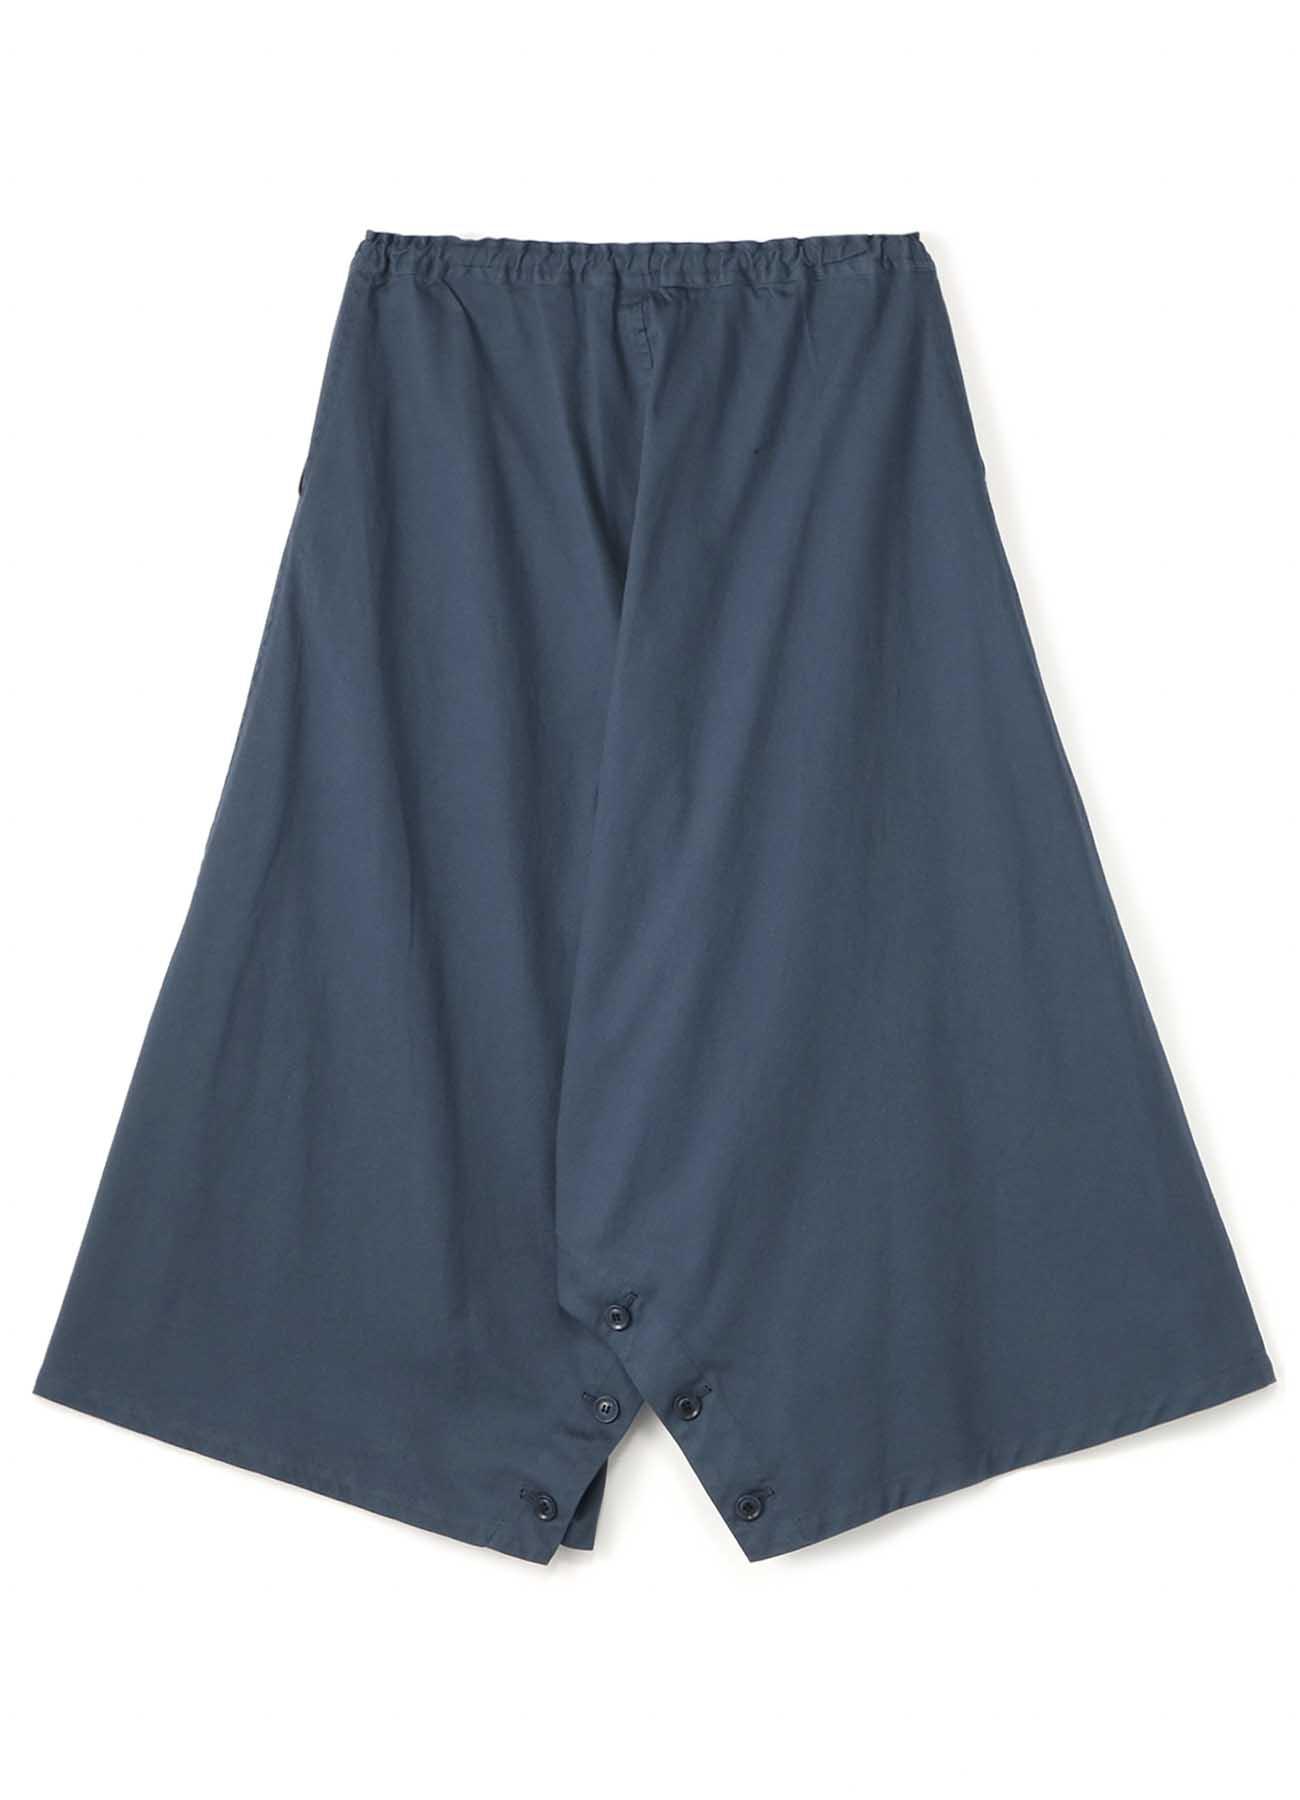 Y's-BORN PRODUCT INSEAM BOTANN OPEN PANTS